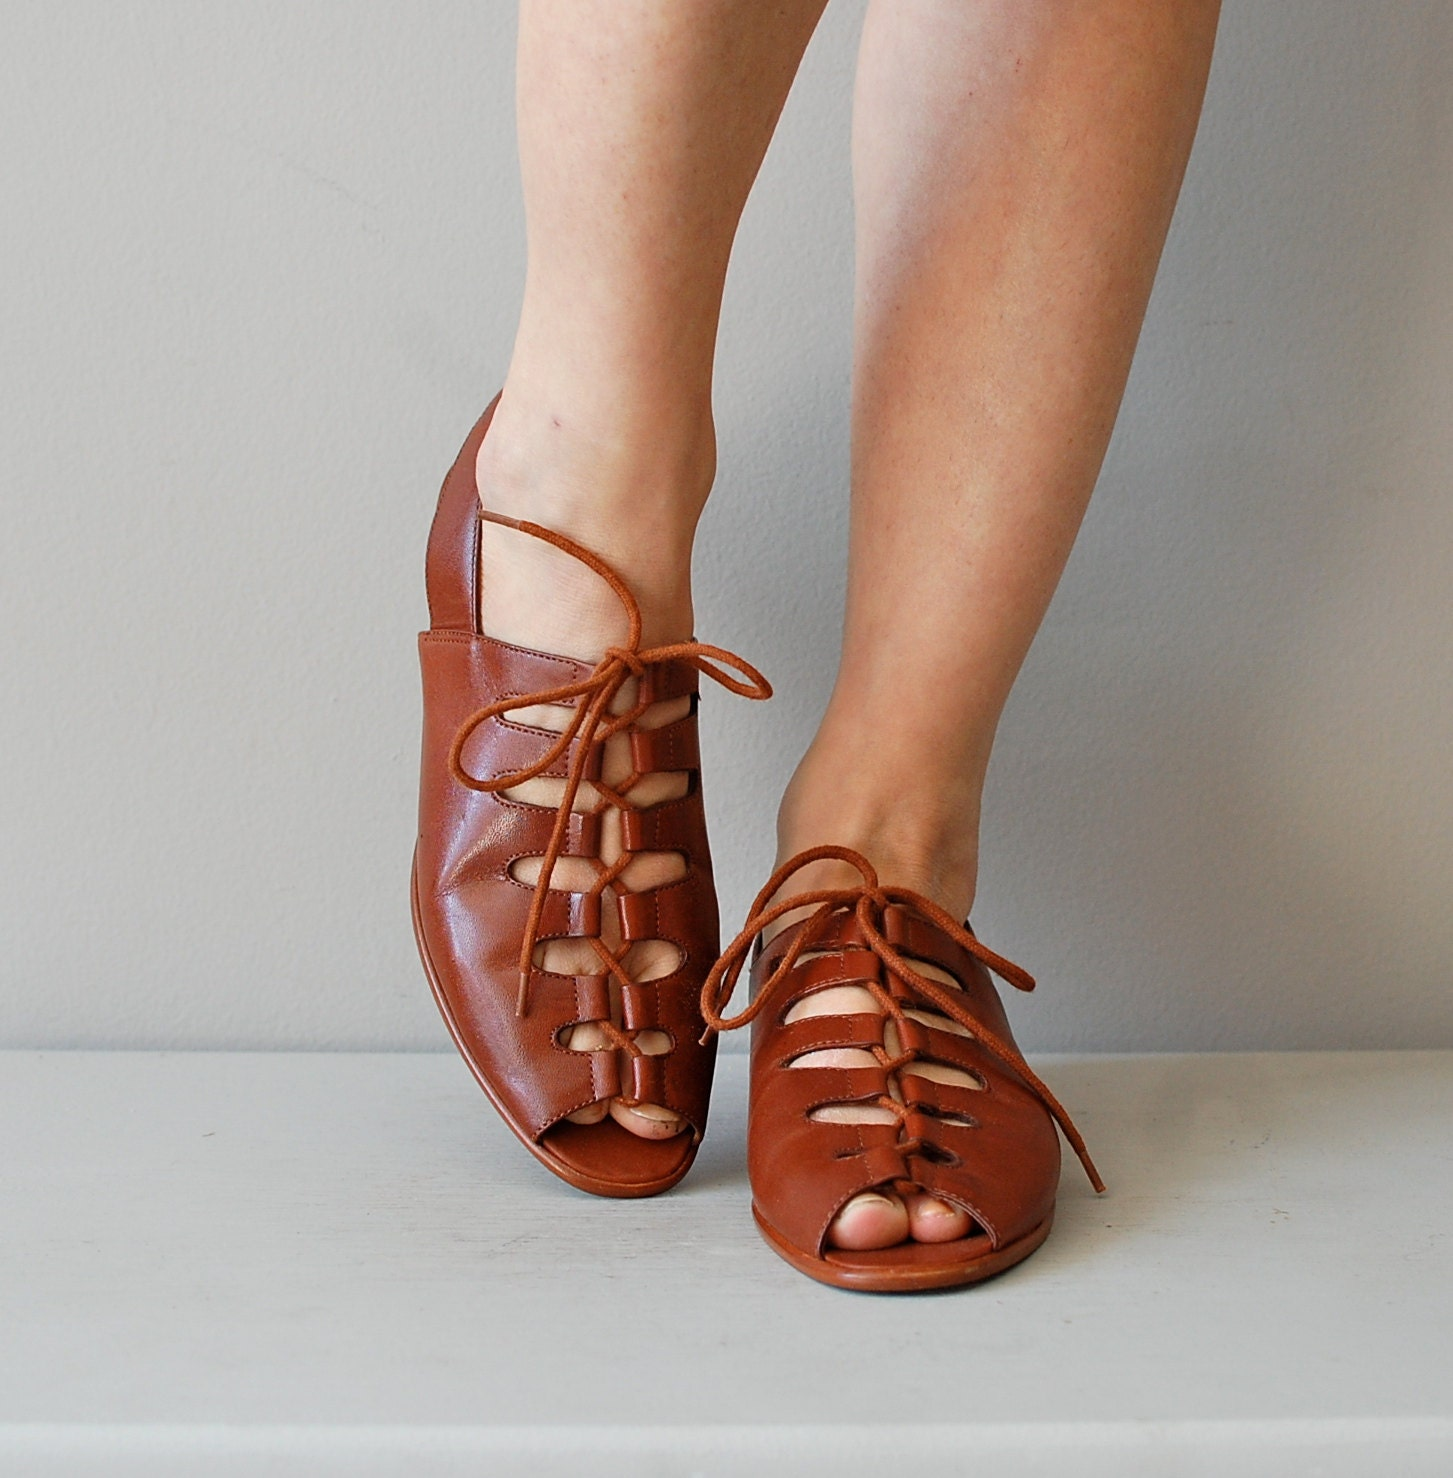 H Wood Shoes Reviews